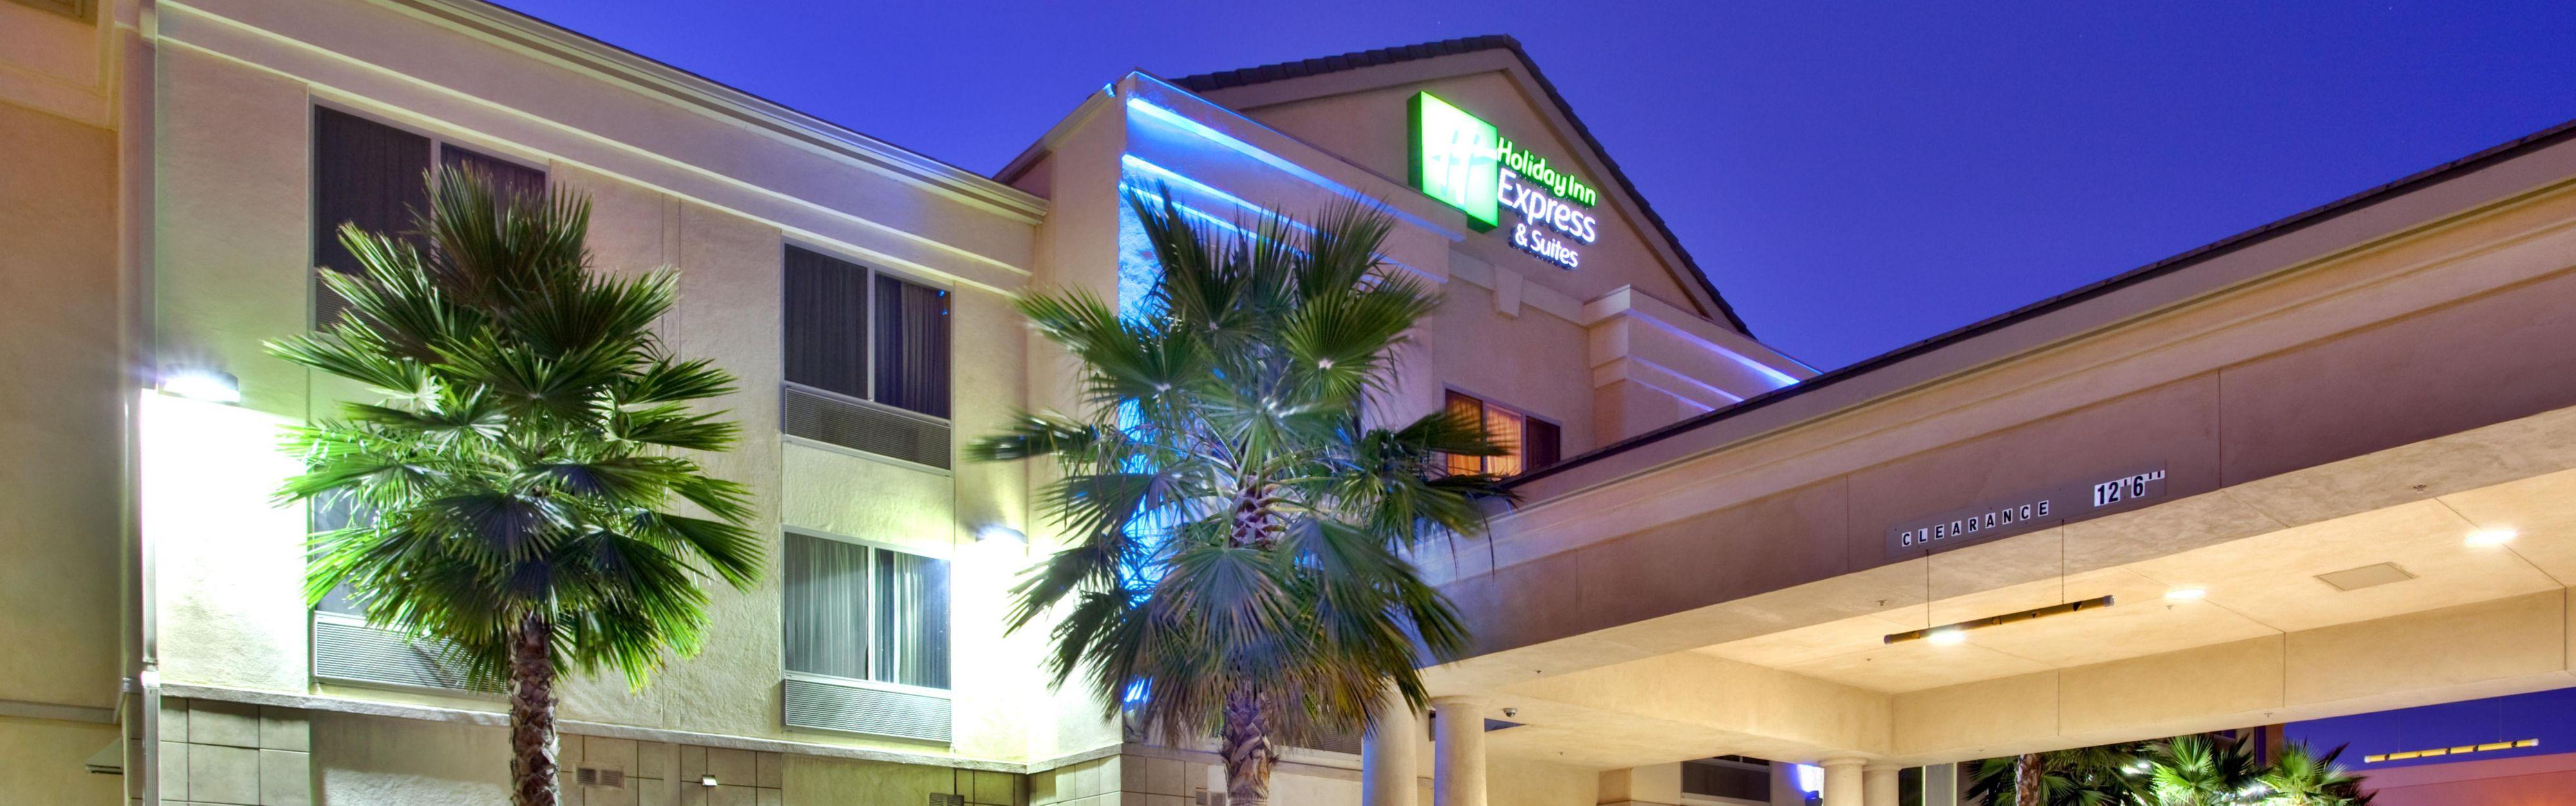 Holiday Inn Express & Suites San Diego Otay Mesa image 0